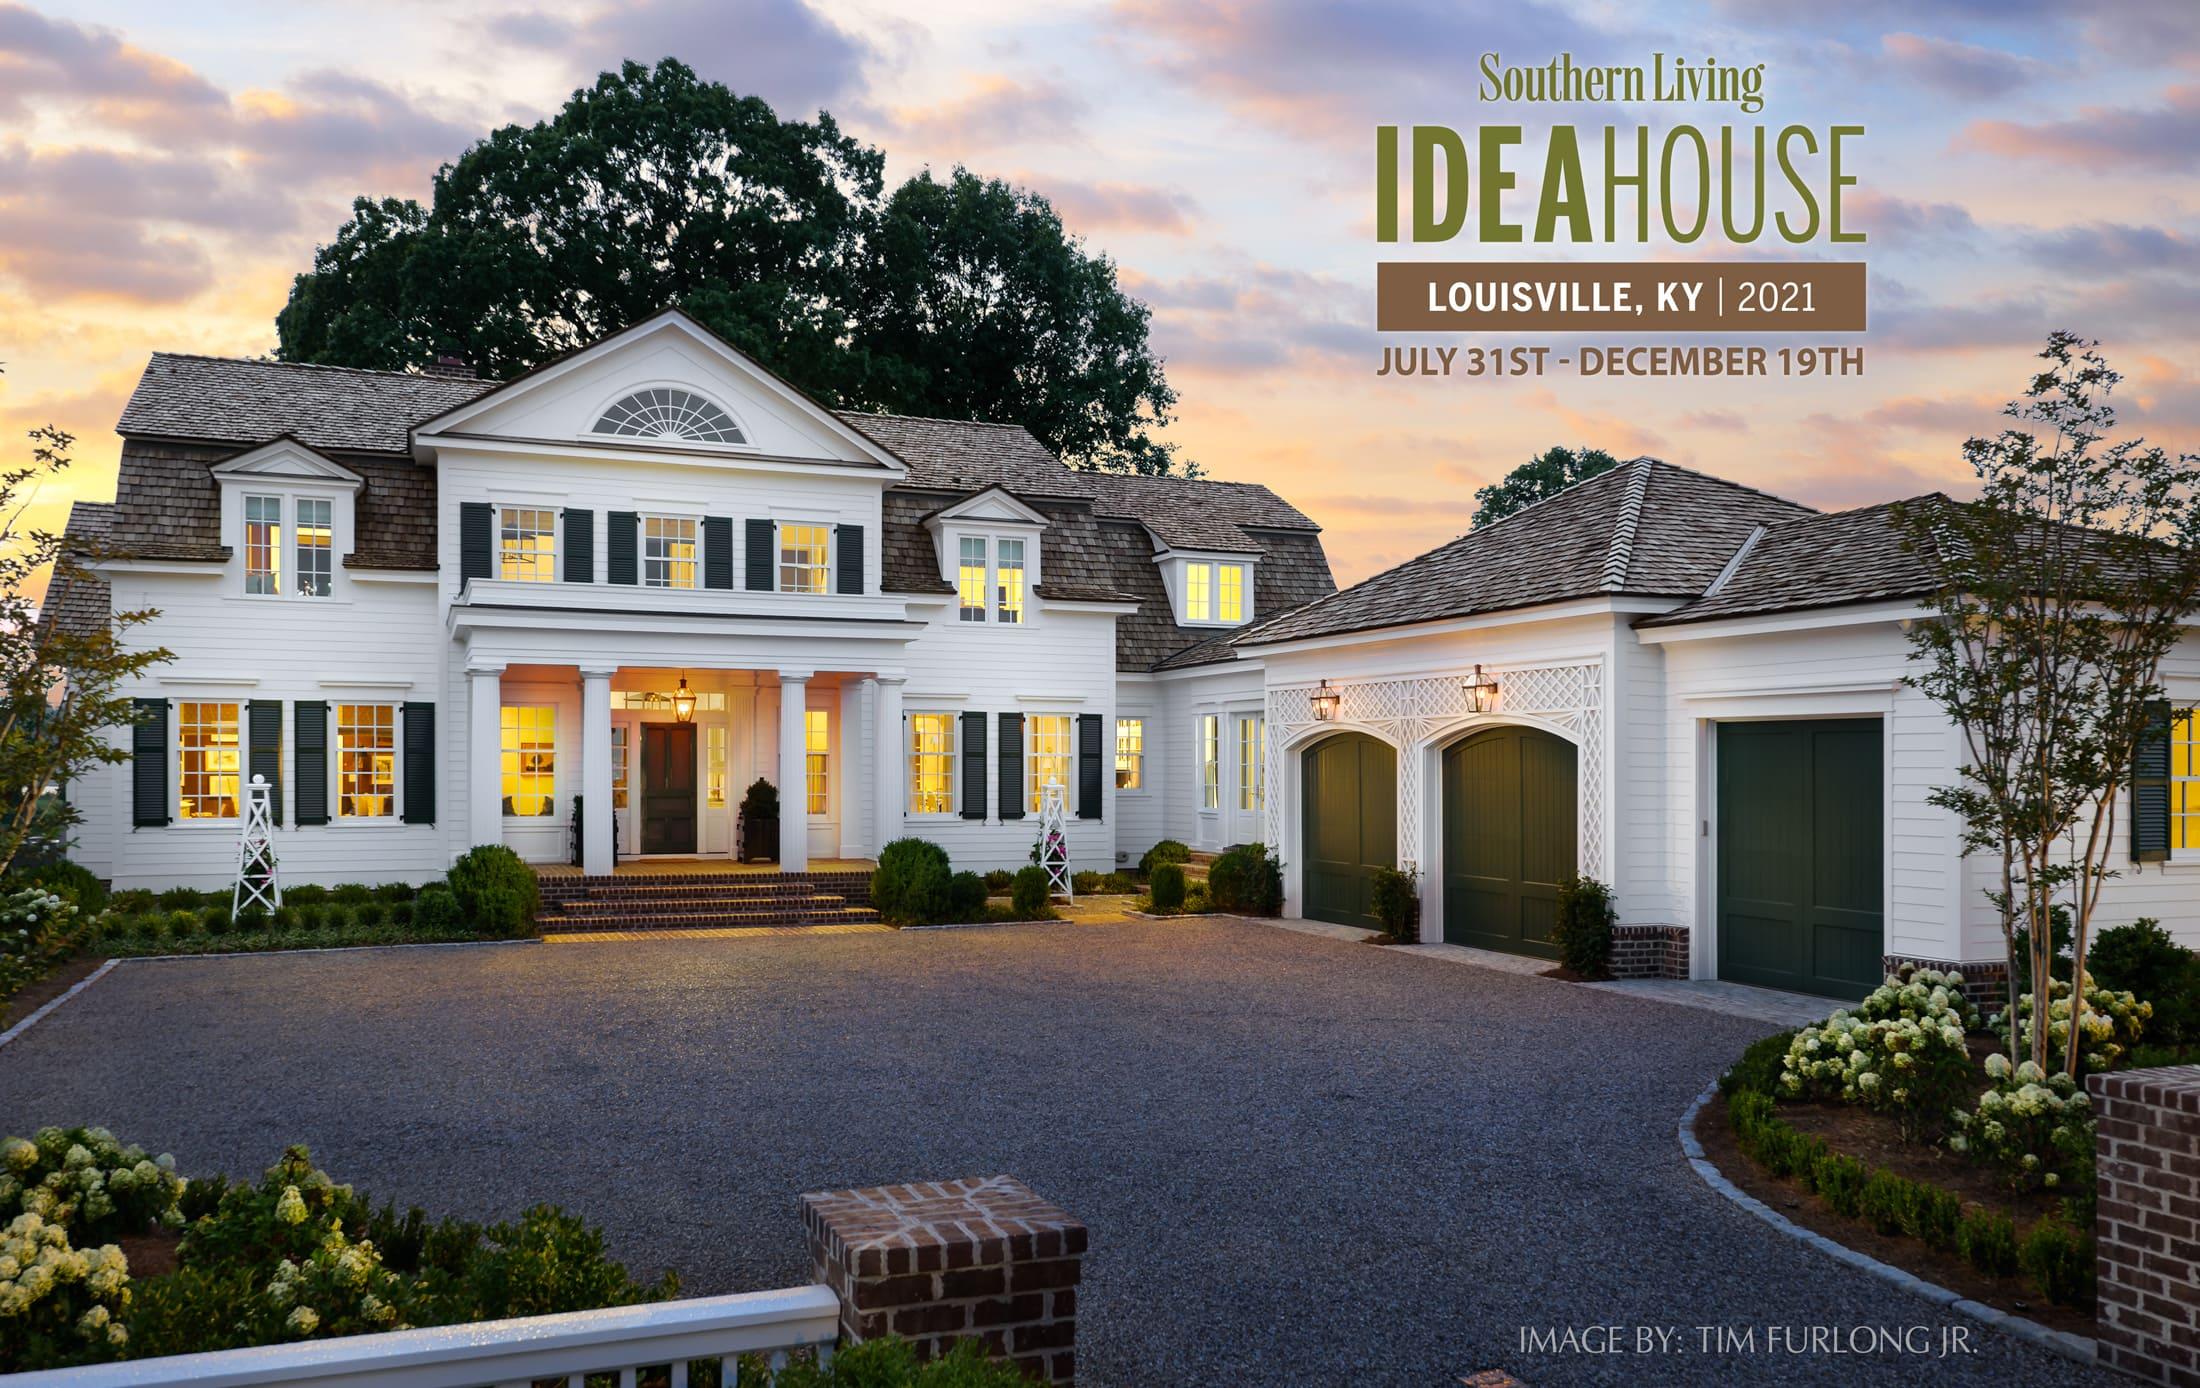 Tim Furlong Jr. - 2021 Southern Living Idea House Official